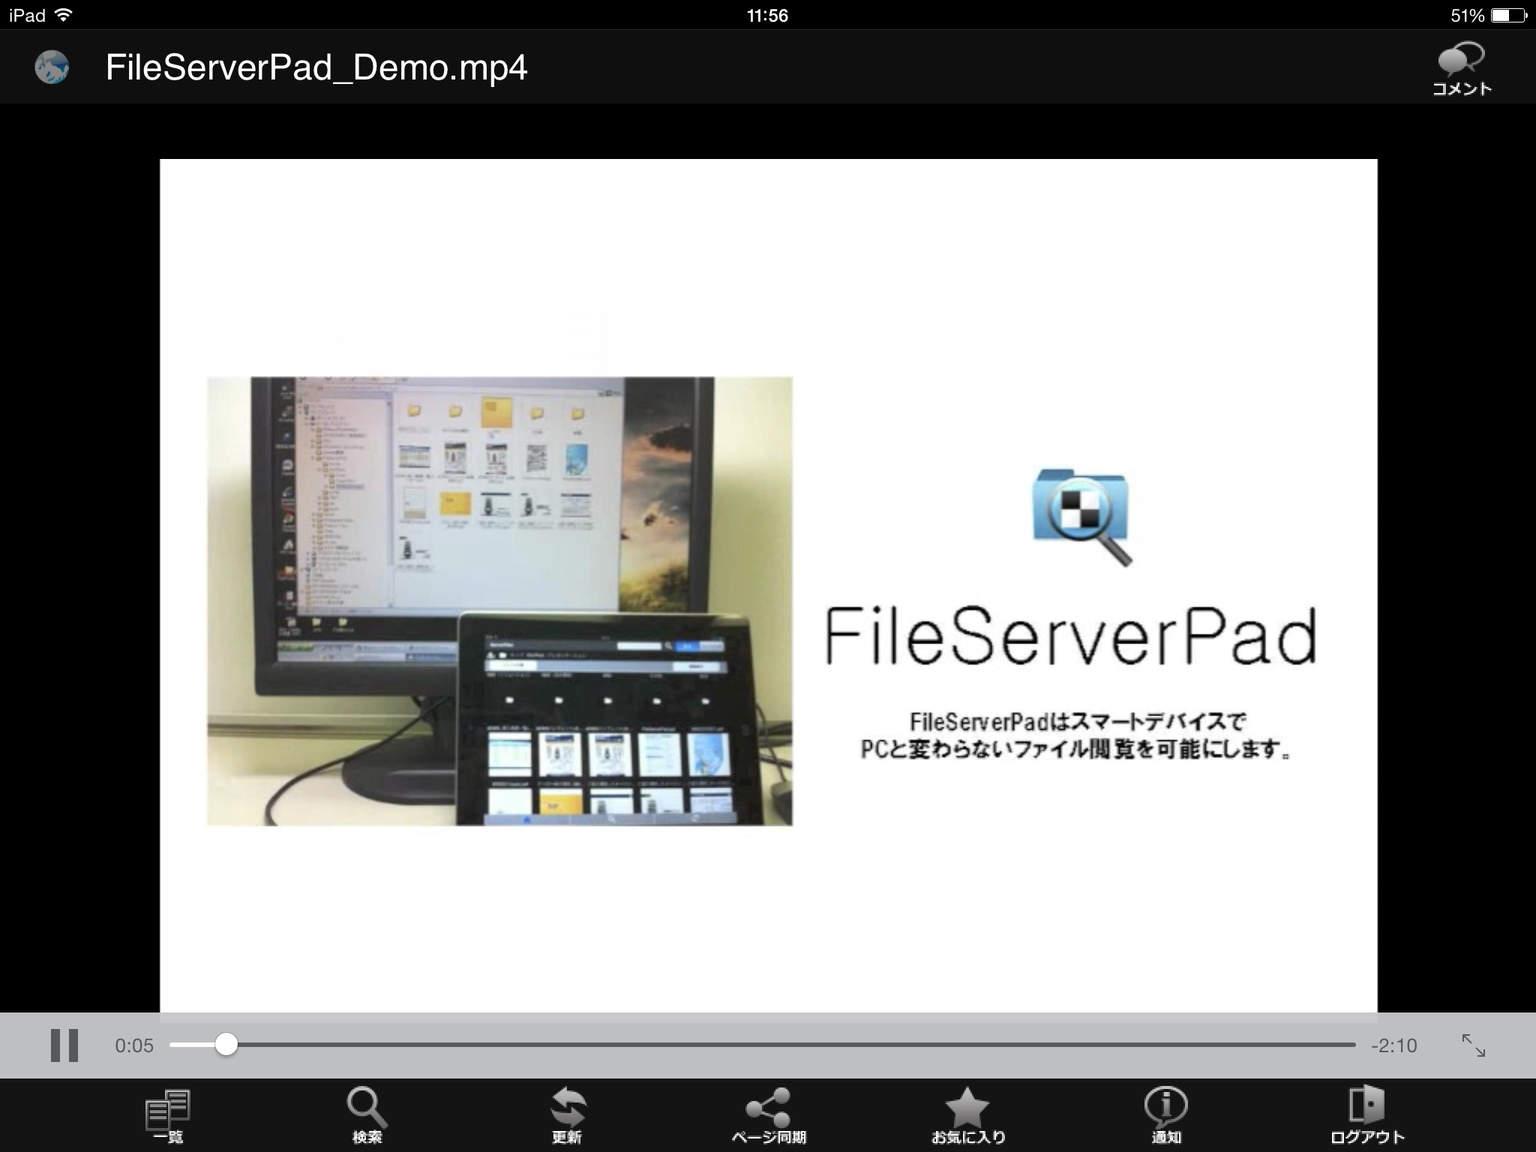 FSP AirLibrary for iPad - オンラインストレージにアクセス! Screenshot